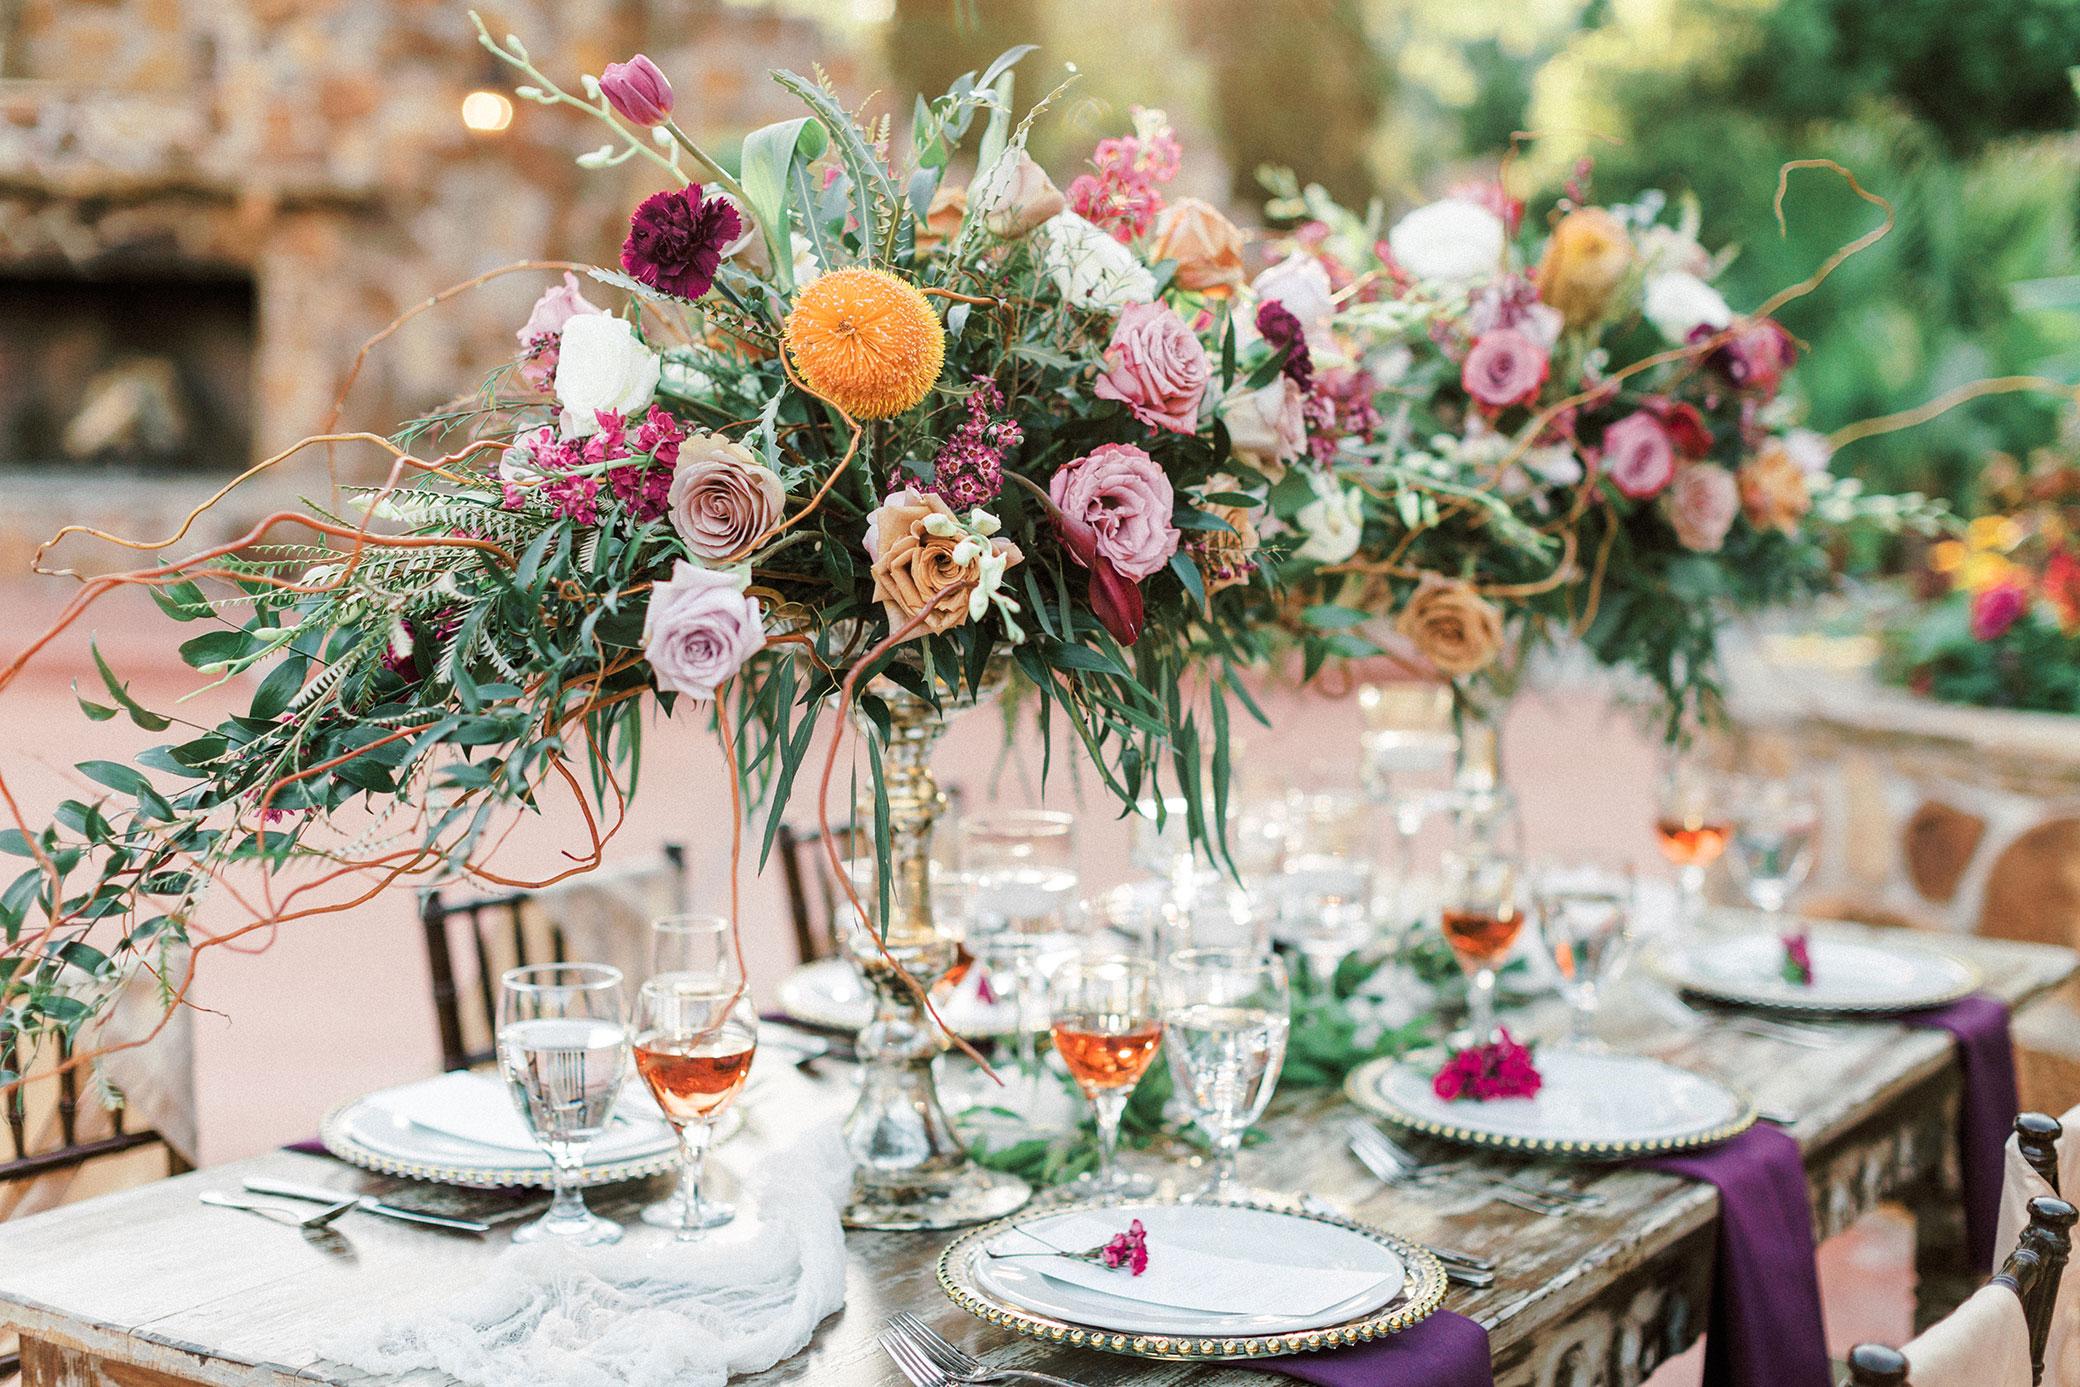 Madera_Estates_Texas_Wedding_Styled_Shoot_1176.jpg